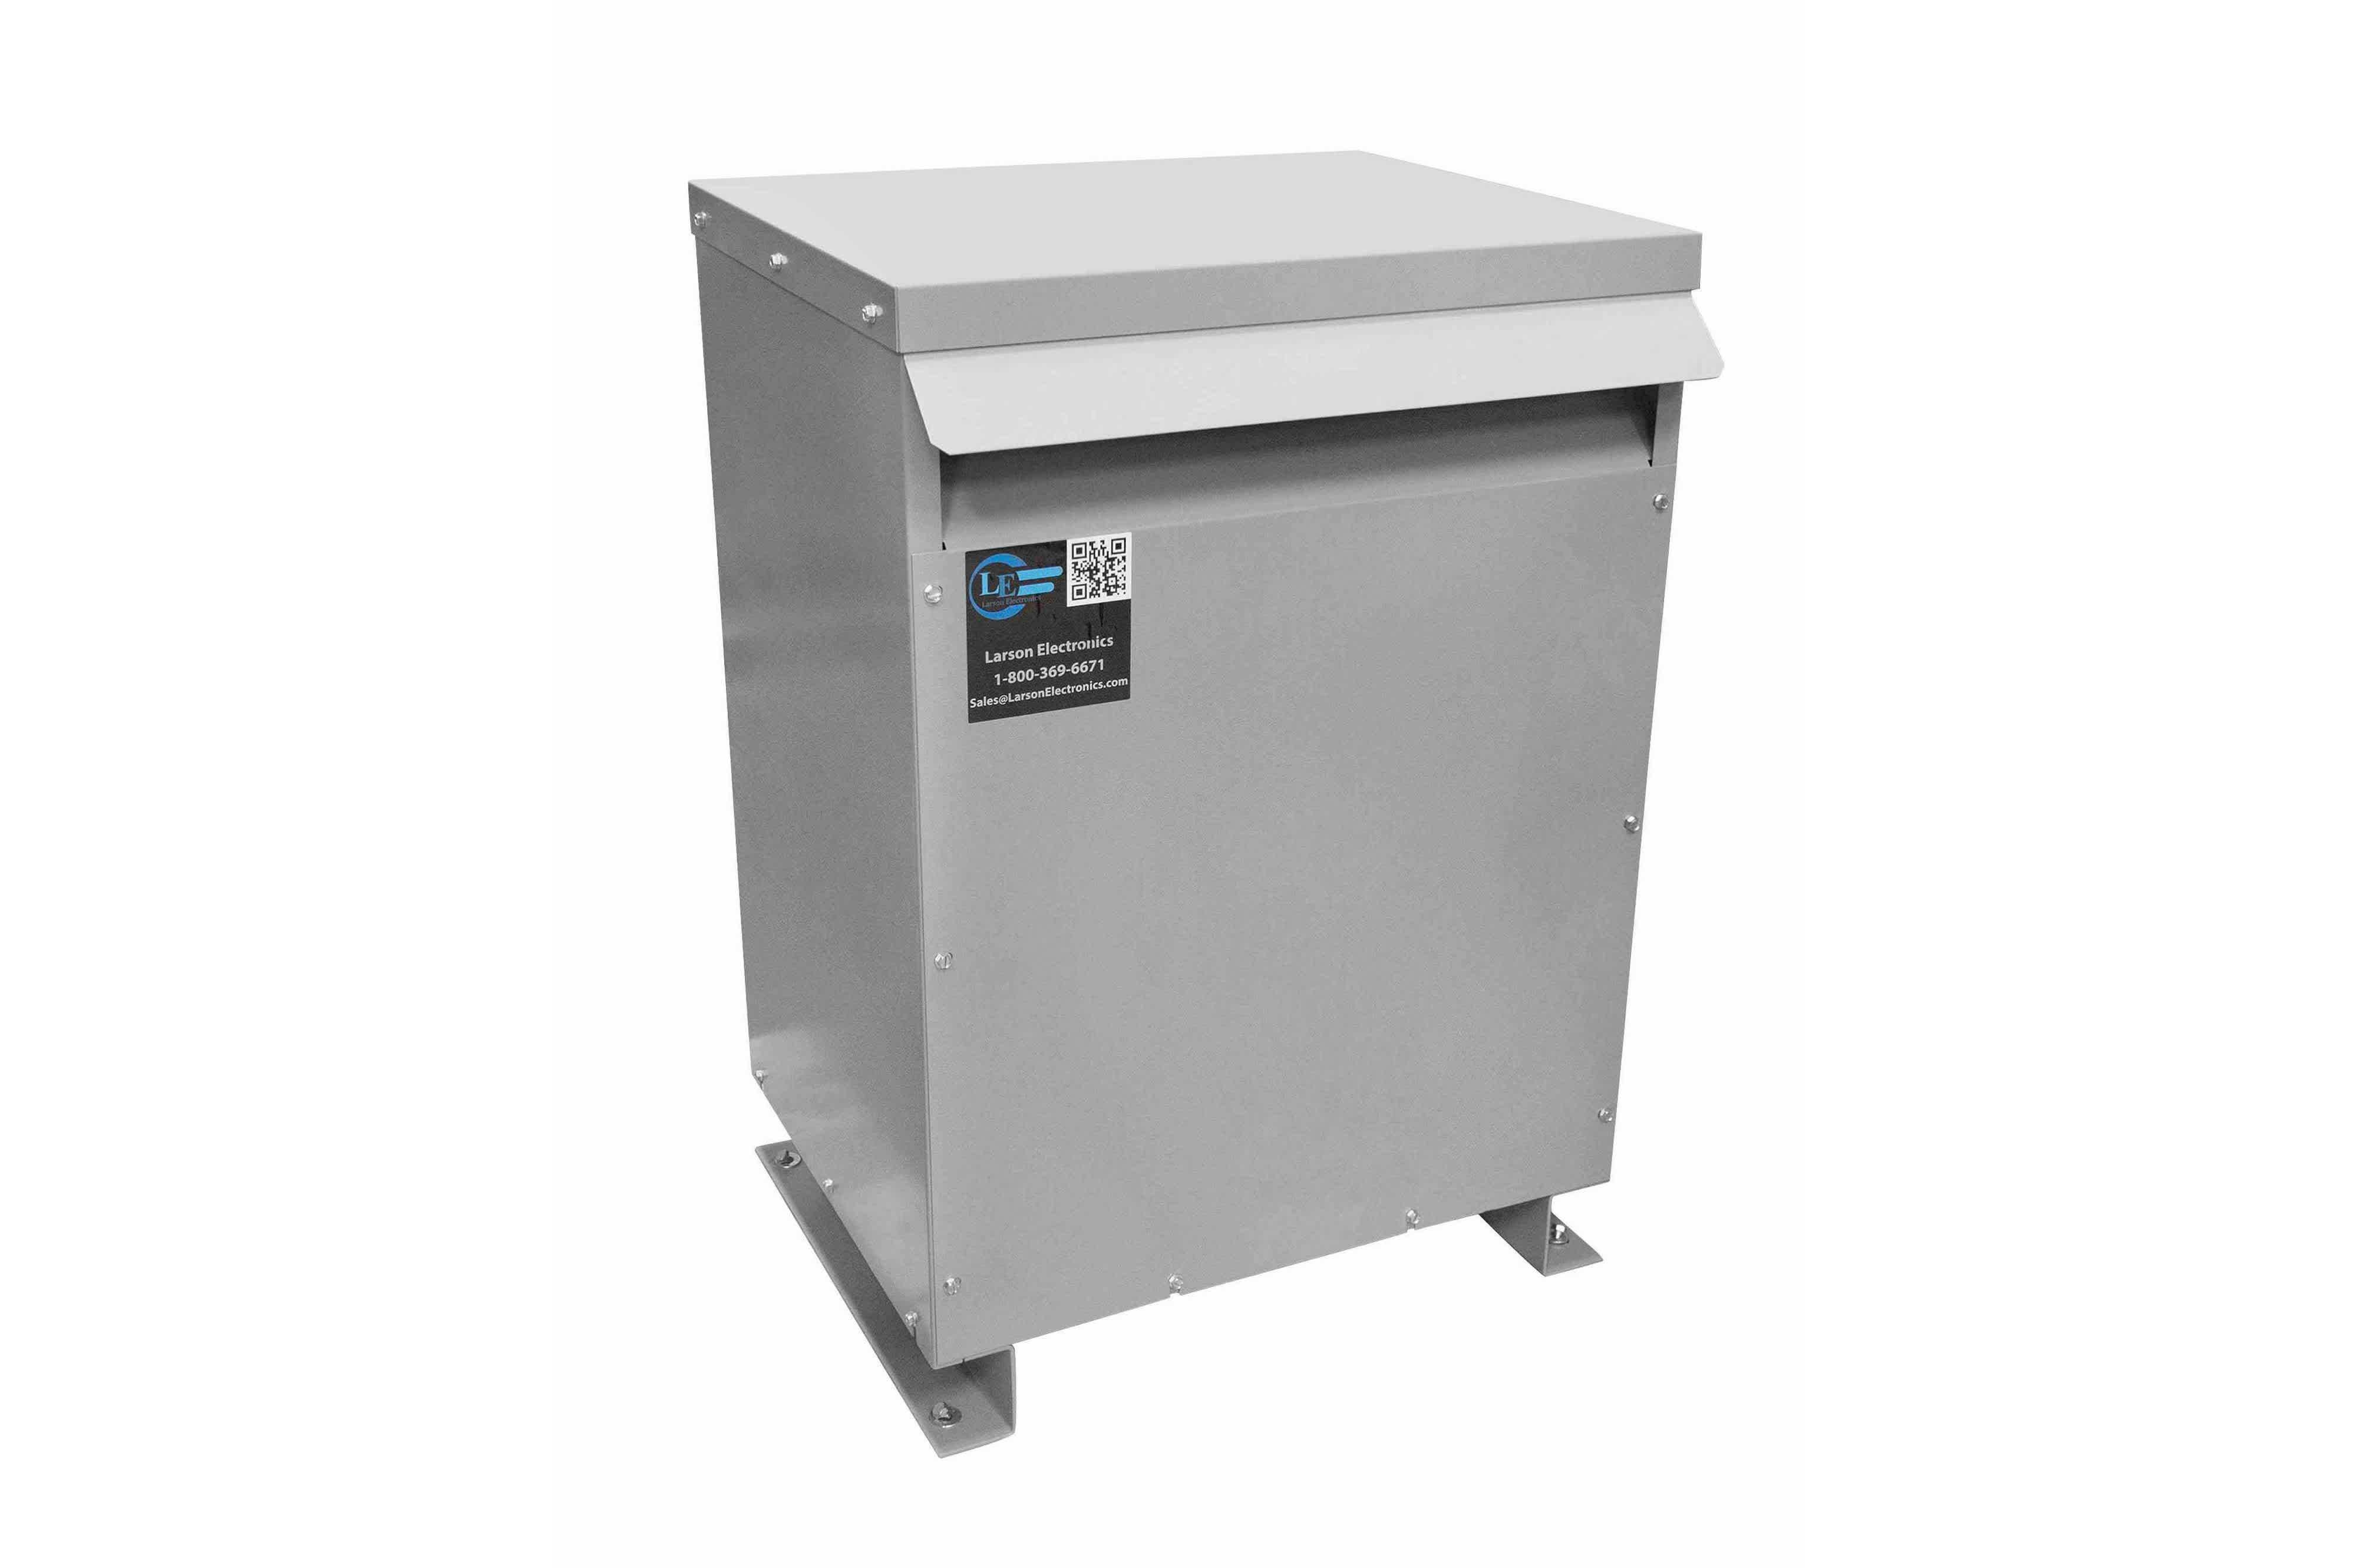 15 kVA 3PH Isolation Transformer, 575V Wye Primary, 208V Delta Secondary, N3R, Ventilated, 60 Hz